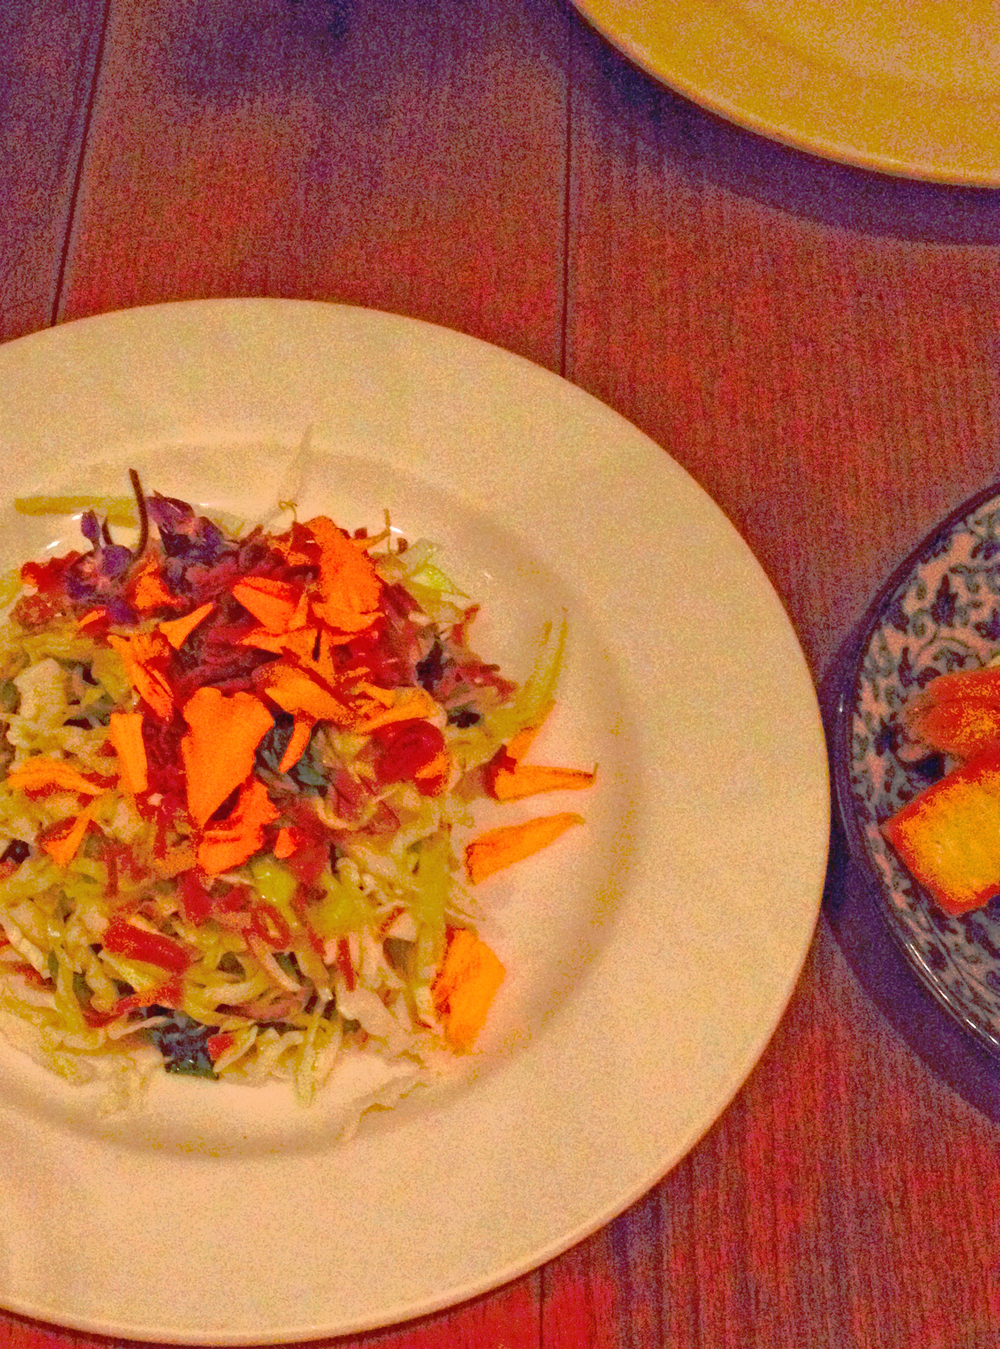 Hamachi tostada with herbs, fish sauce vinaigrette, and peanuts.